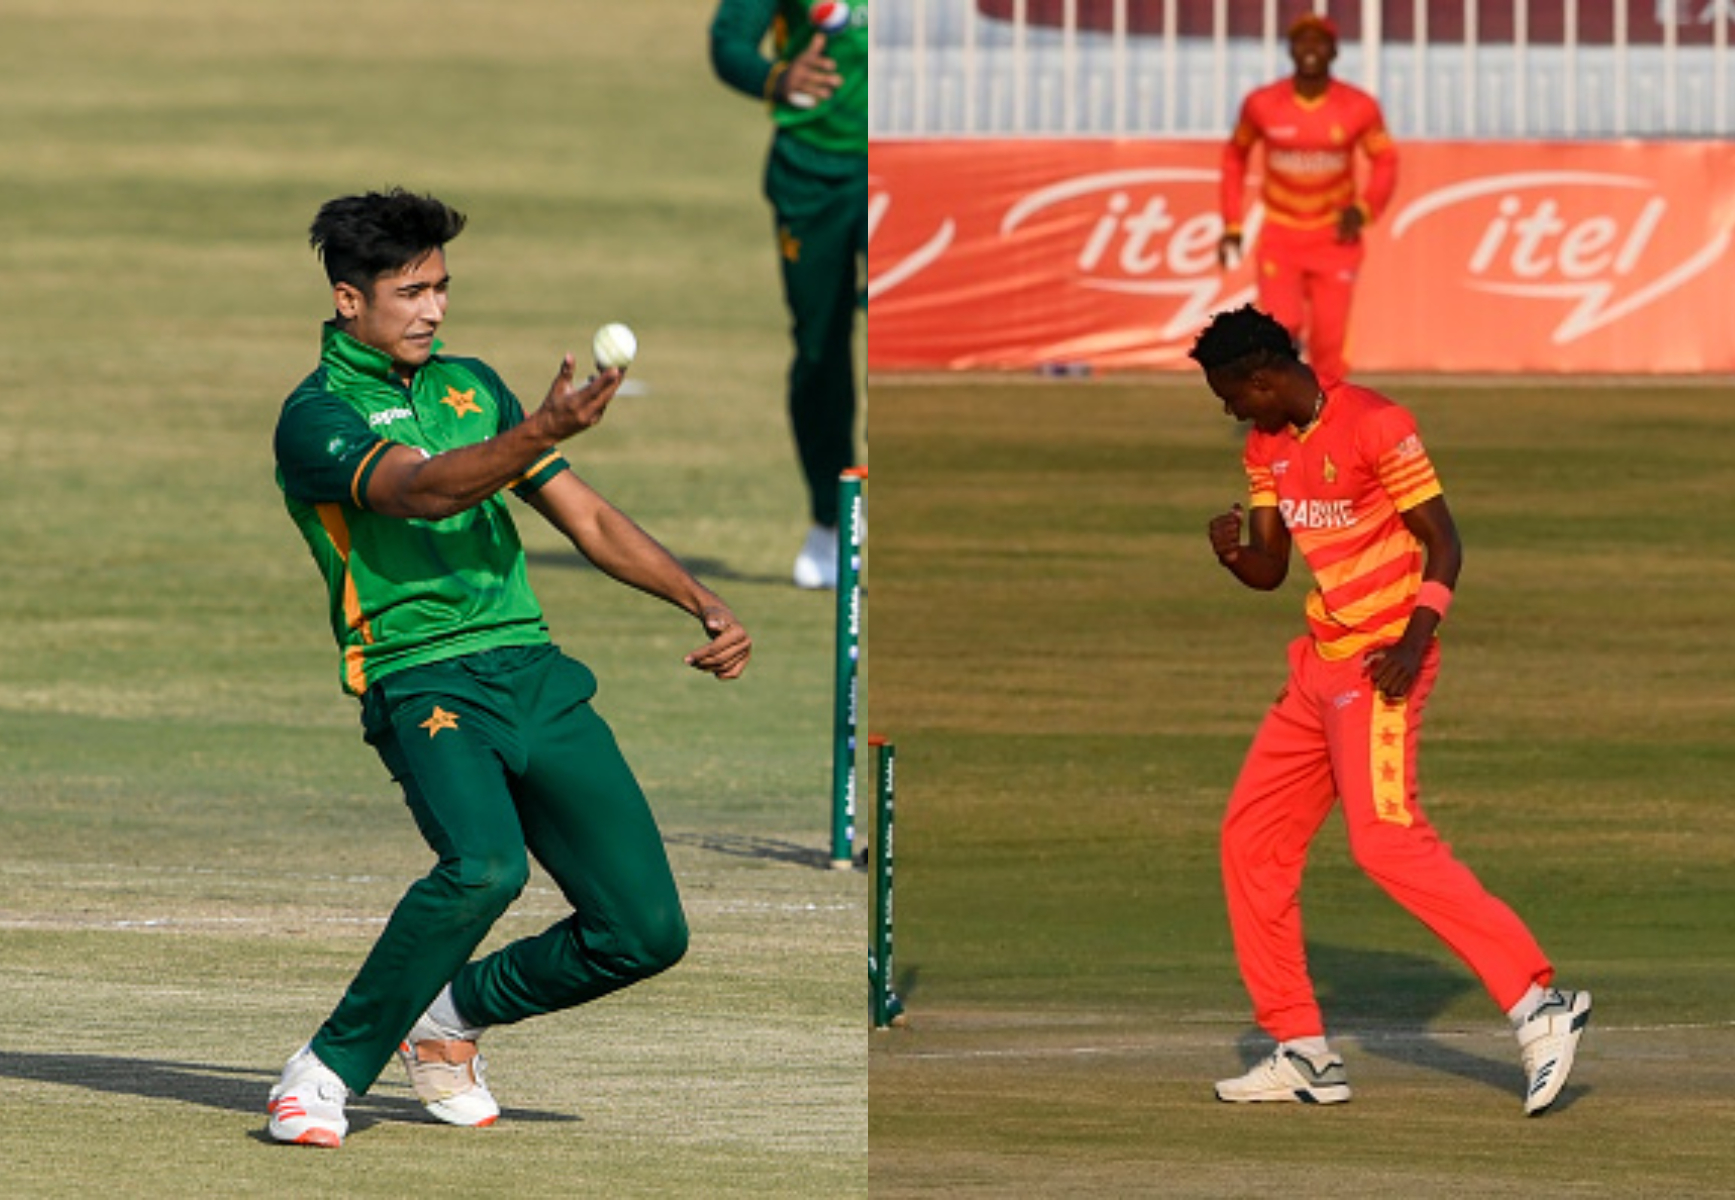 Hasnain and Muzarabani picked fifers for Pakistan and Zimbabwe respectively   Getty